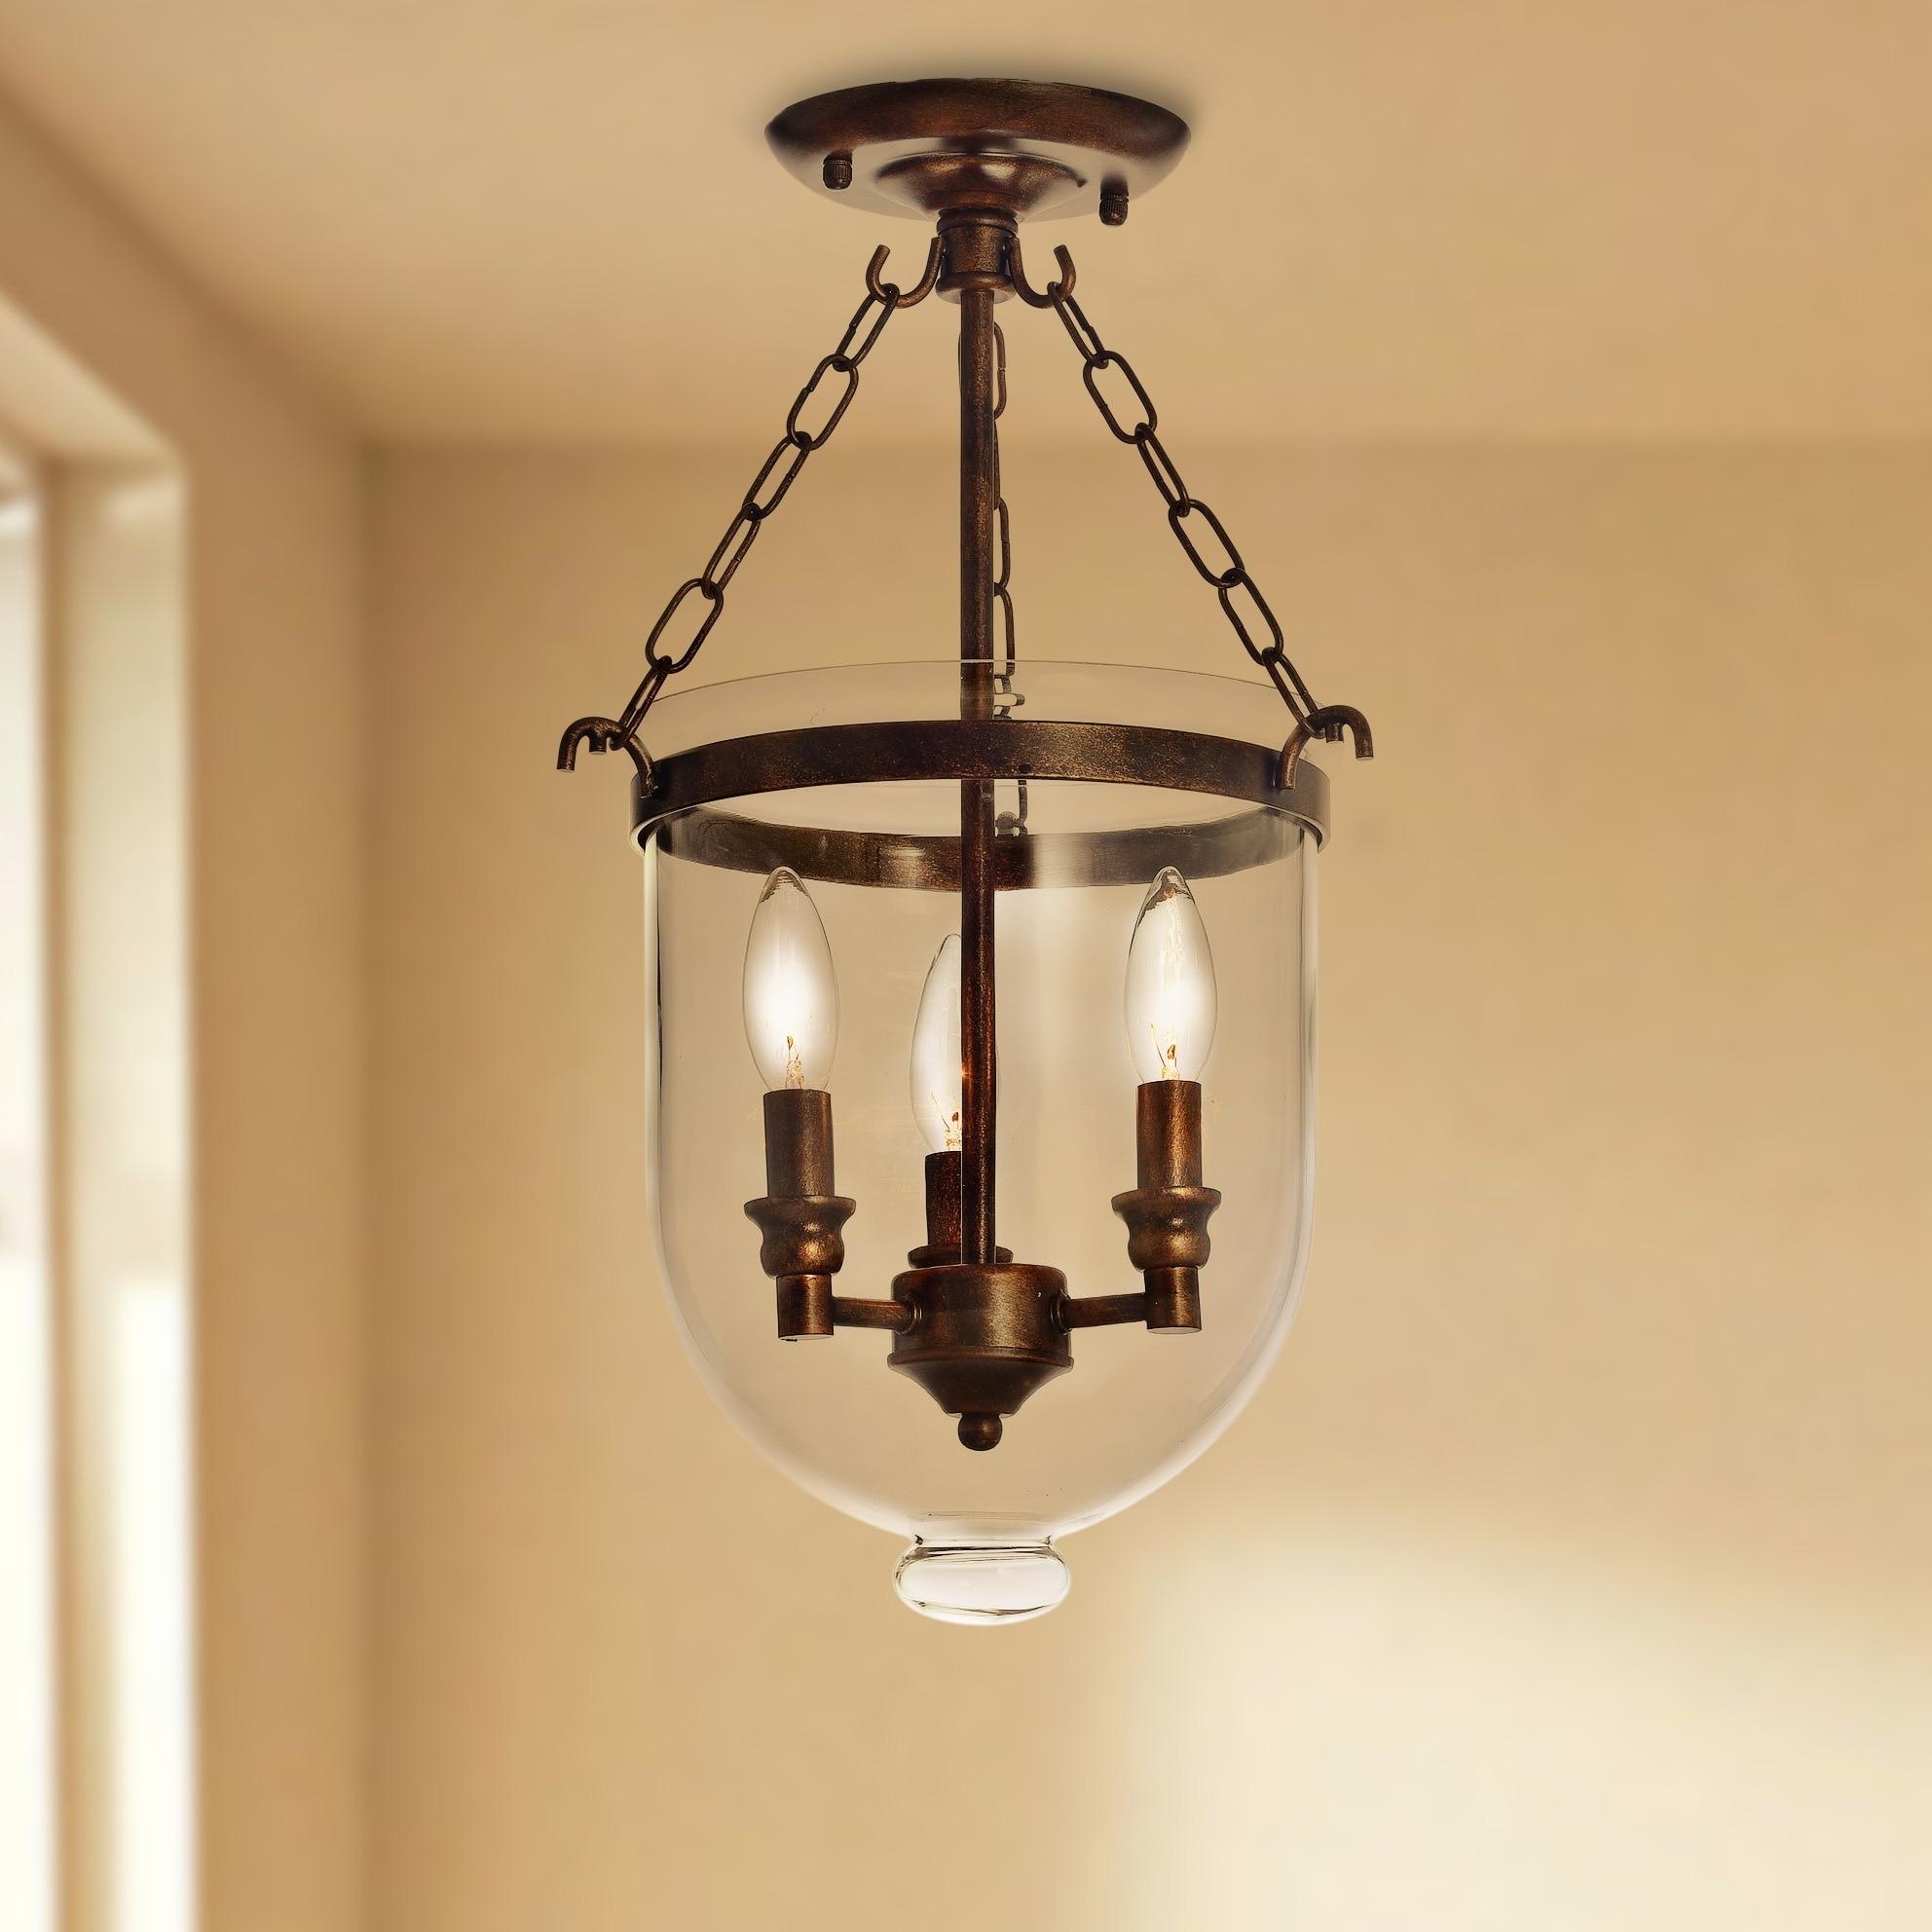 holophane hanoi fitting en light mount of chandeliers ceiling vintage picture lighting mullan flush chandelier